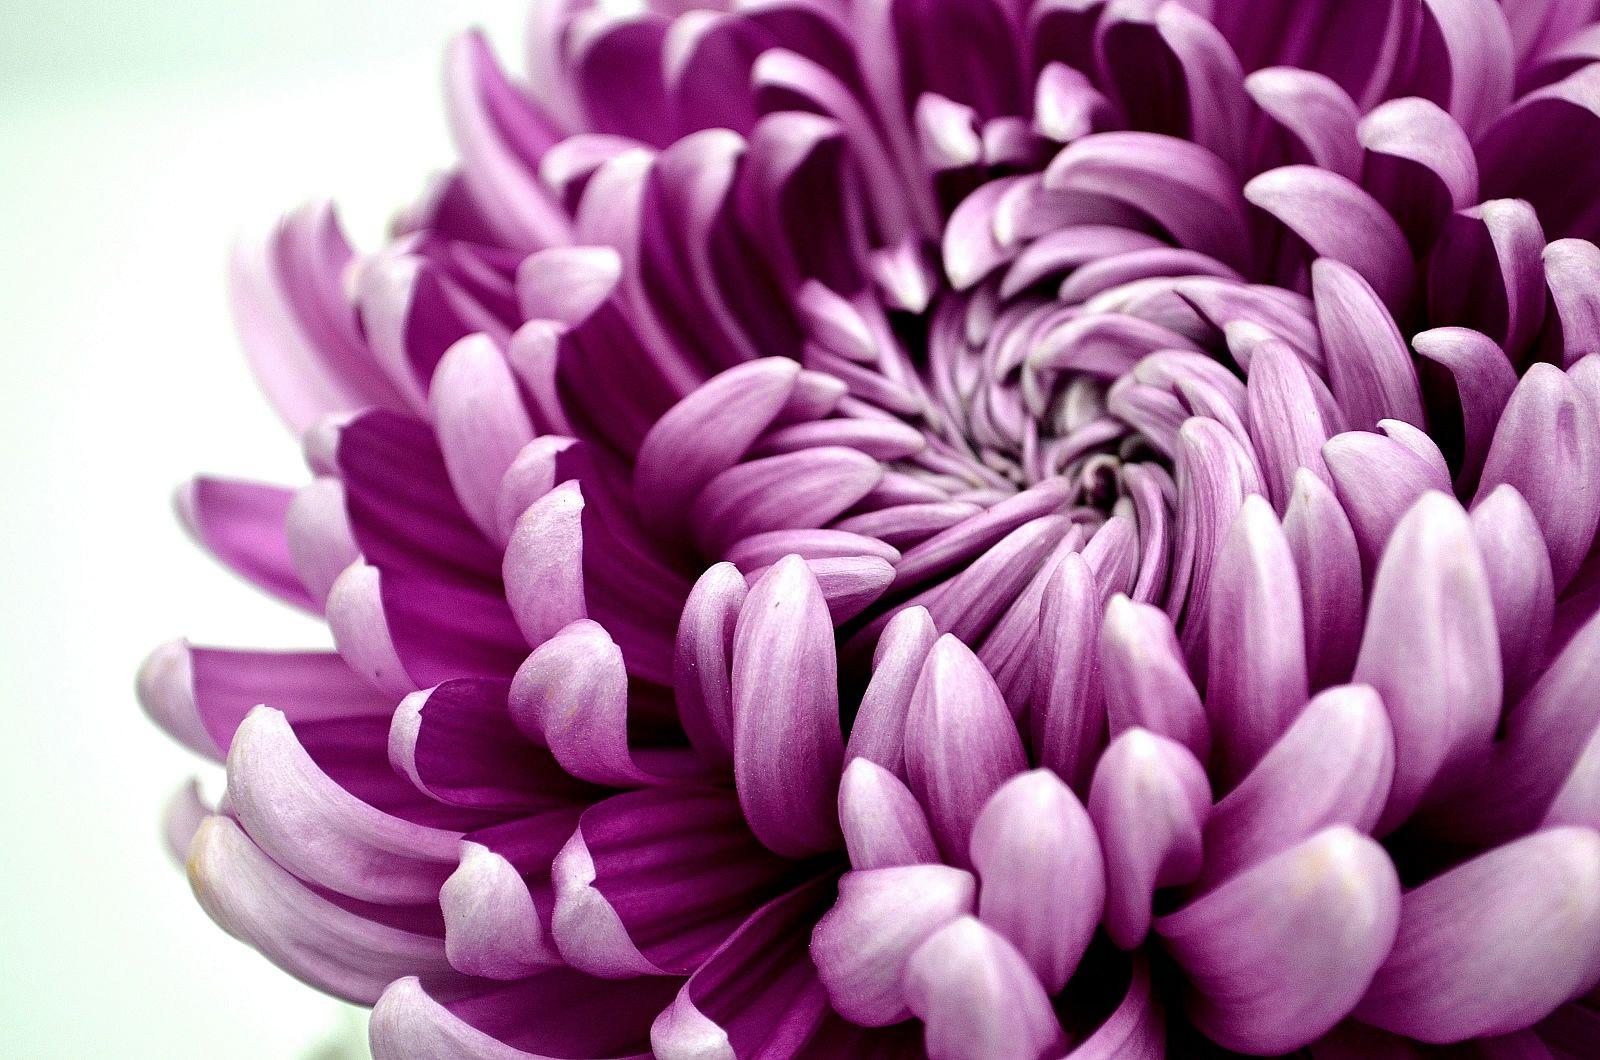 Chrysanthemum-disbud.jpg 1,600×1,060 pixels